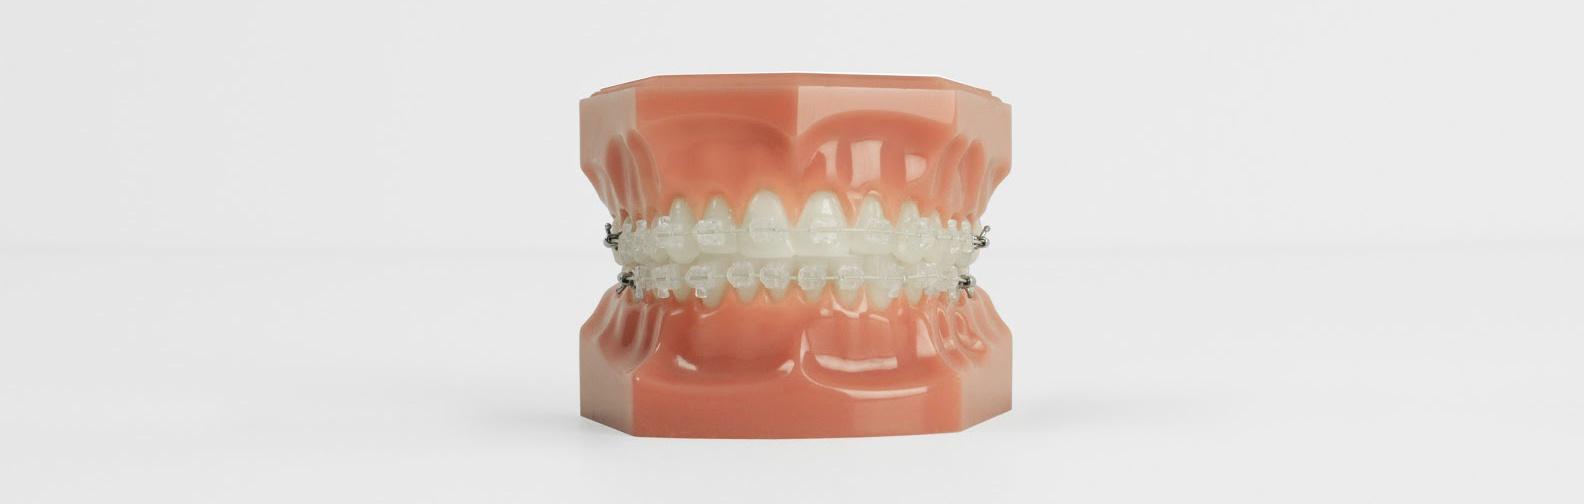 braces_image.jpg